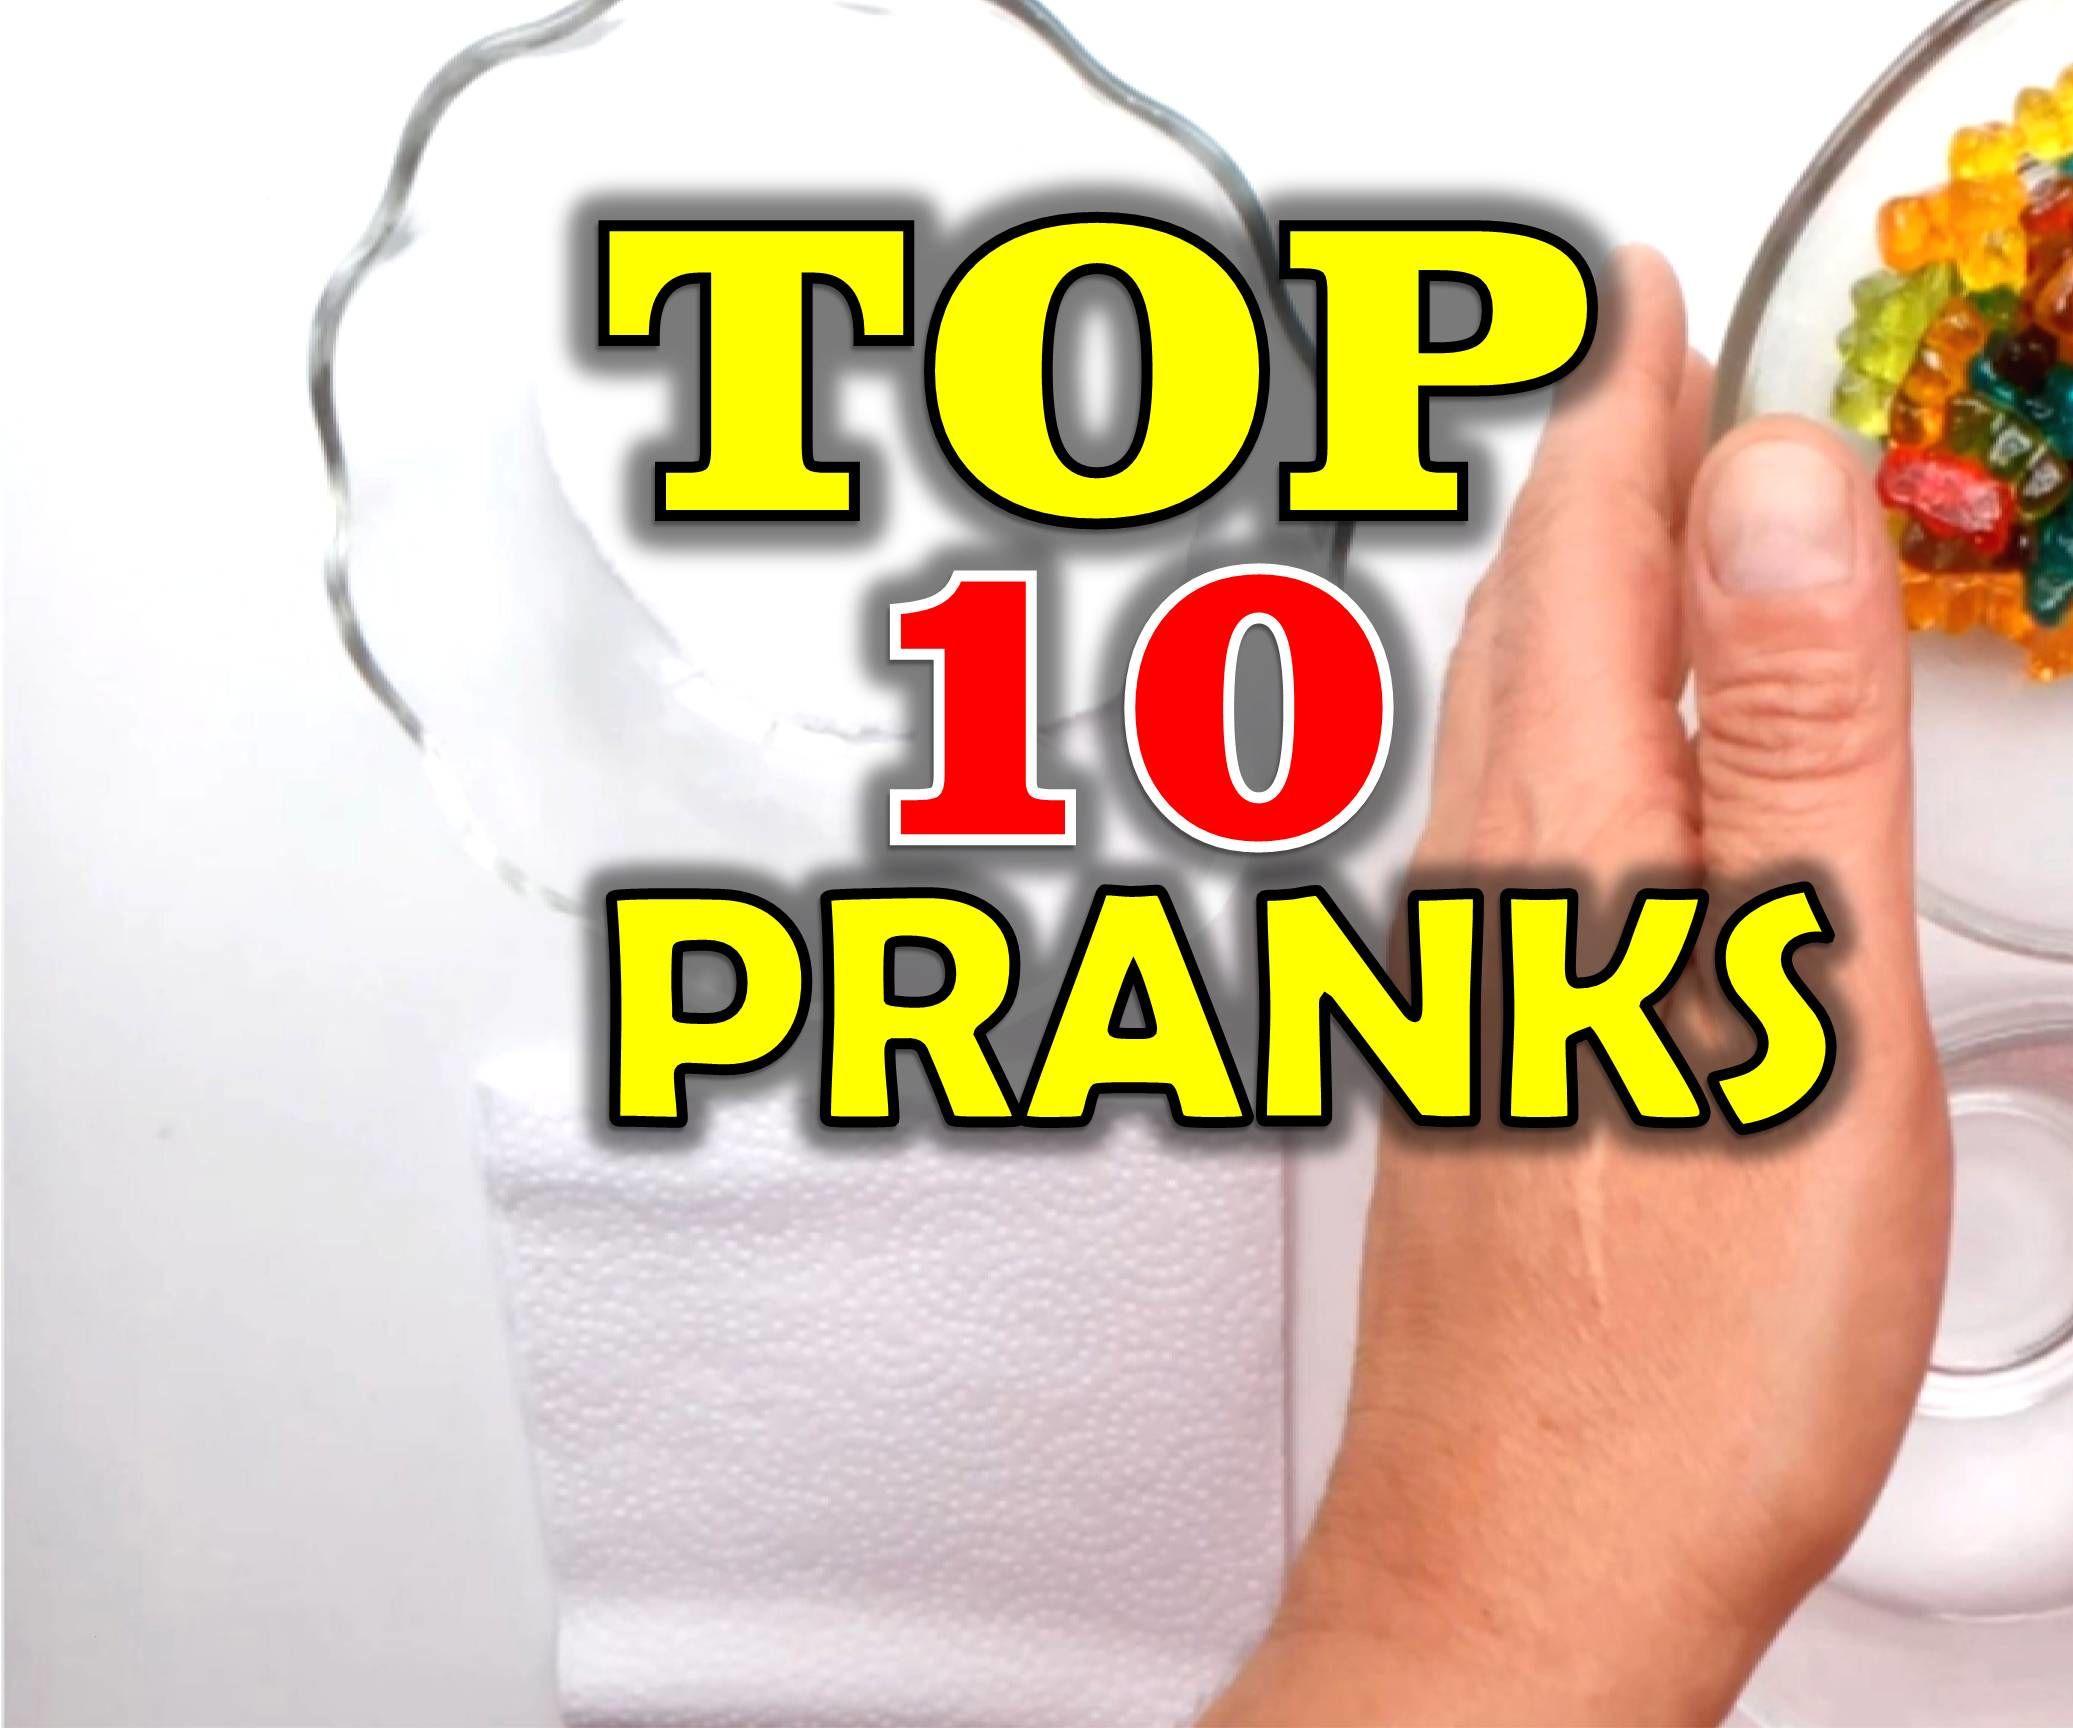 Top 10 Pranks - Pranks to Make to Your Friends